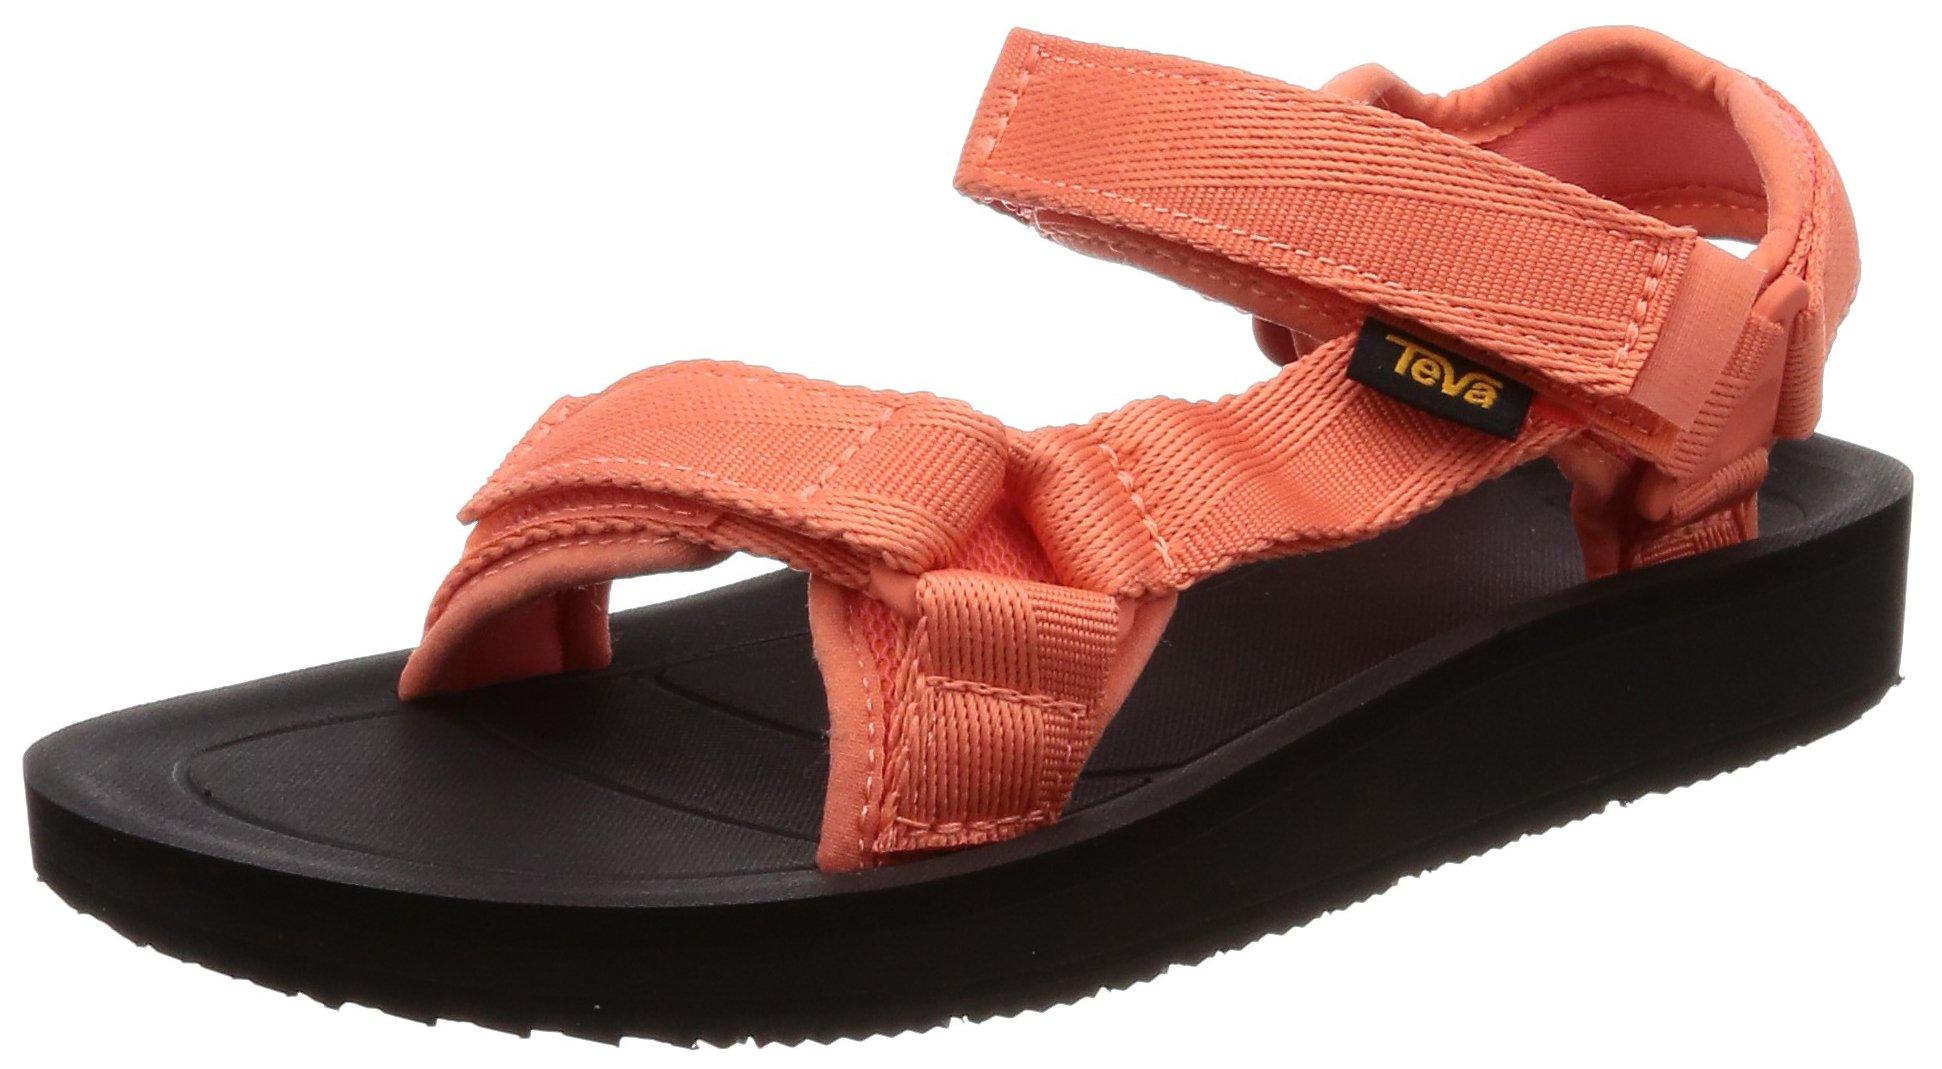 0808399fb68d Teva Women s W Original Universal Premier Sandal - RV Travel ...